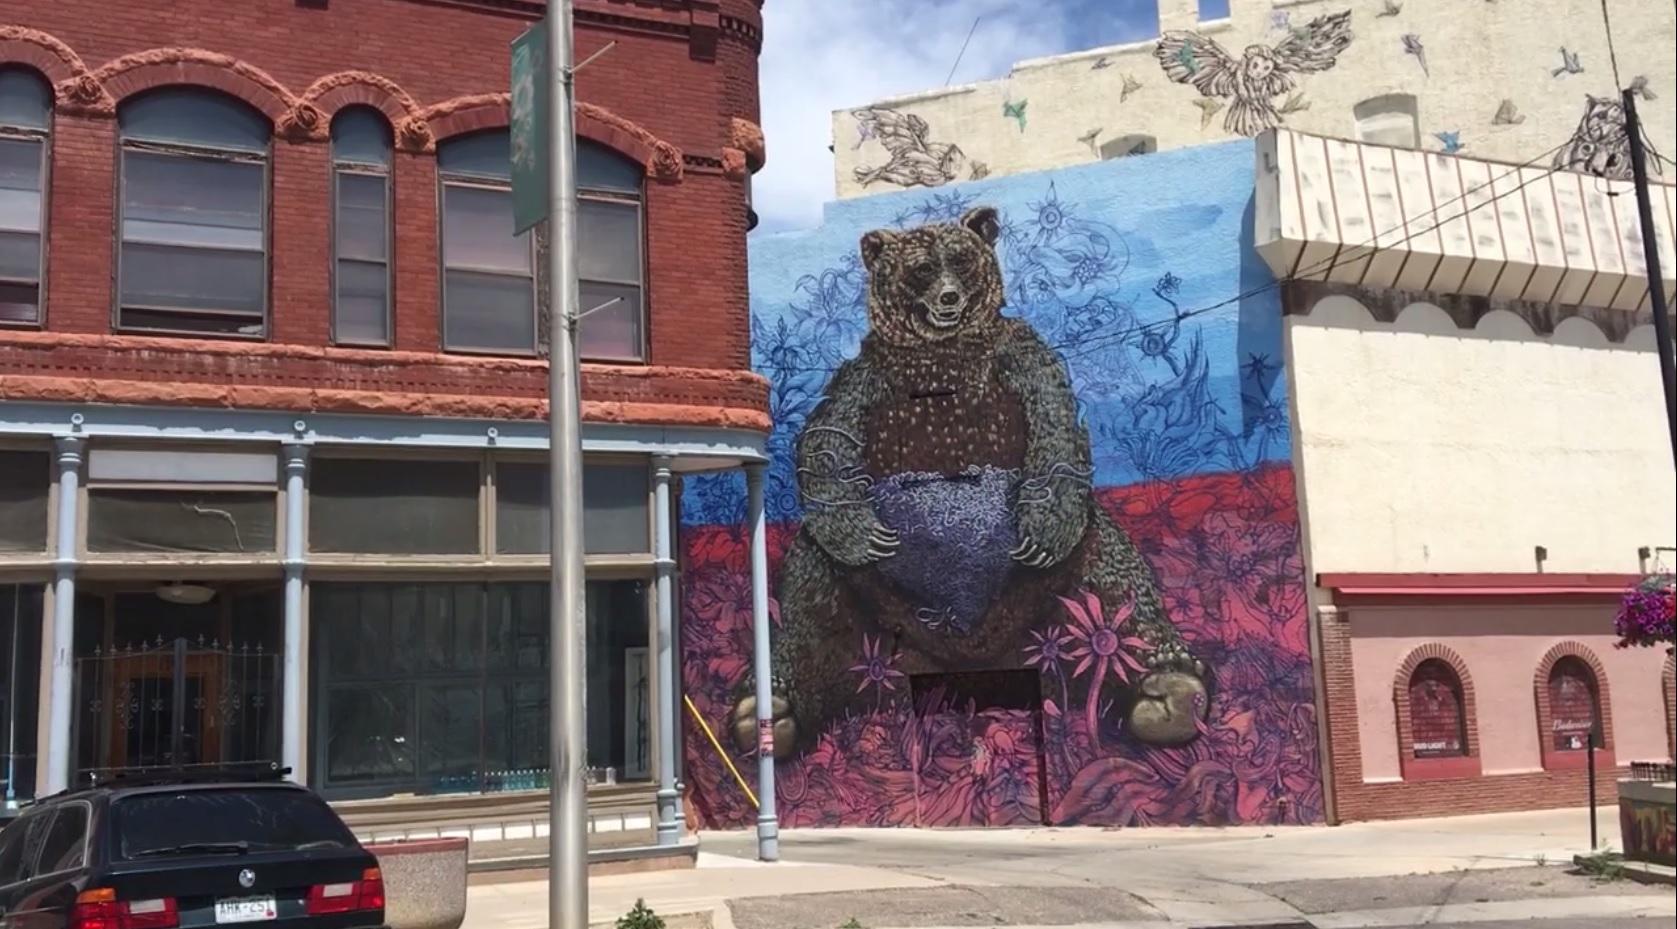 Mural by Matte Refic, Christina Dawidowicz FOX21 News